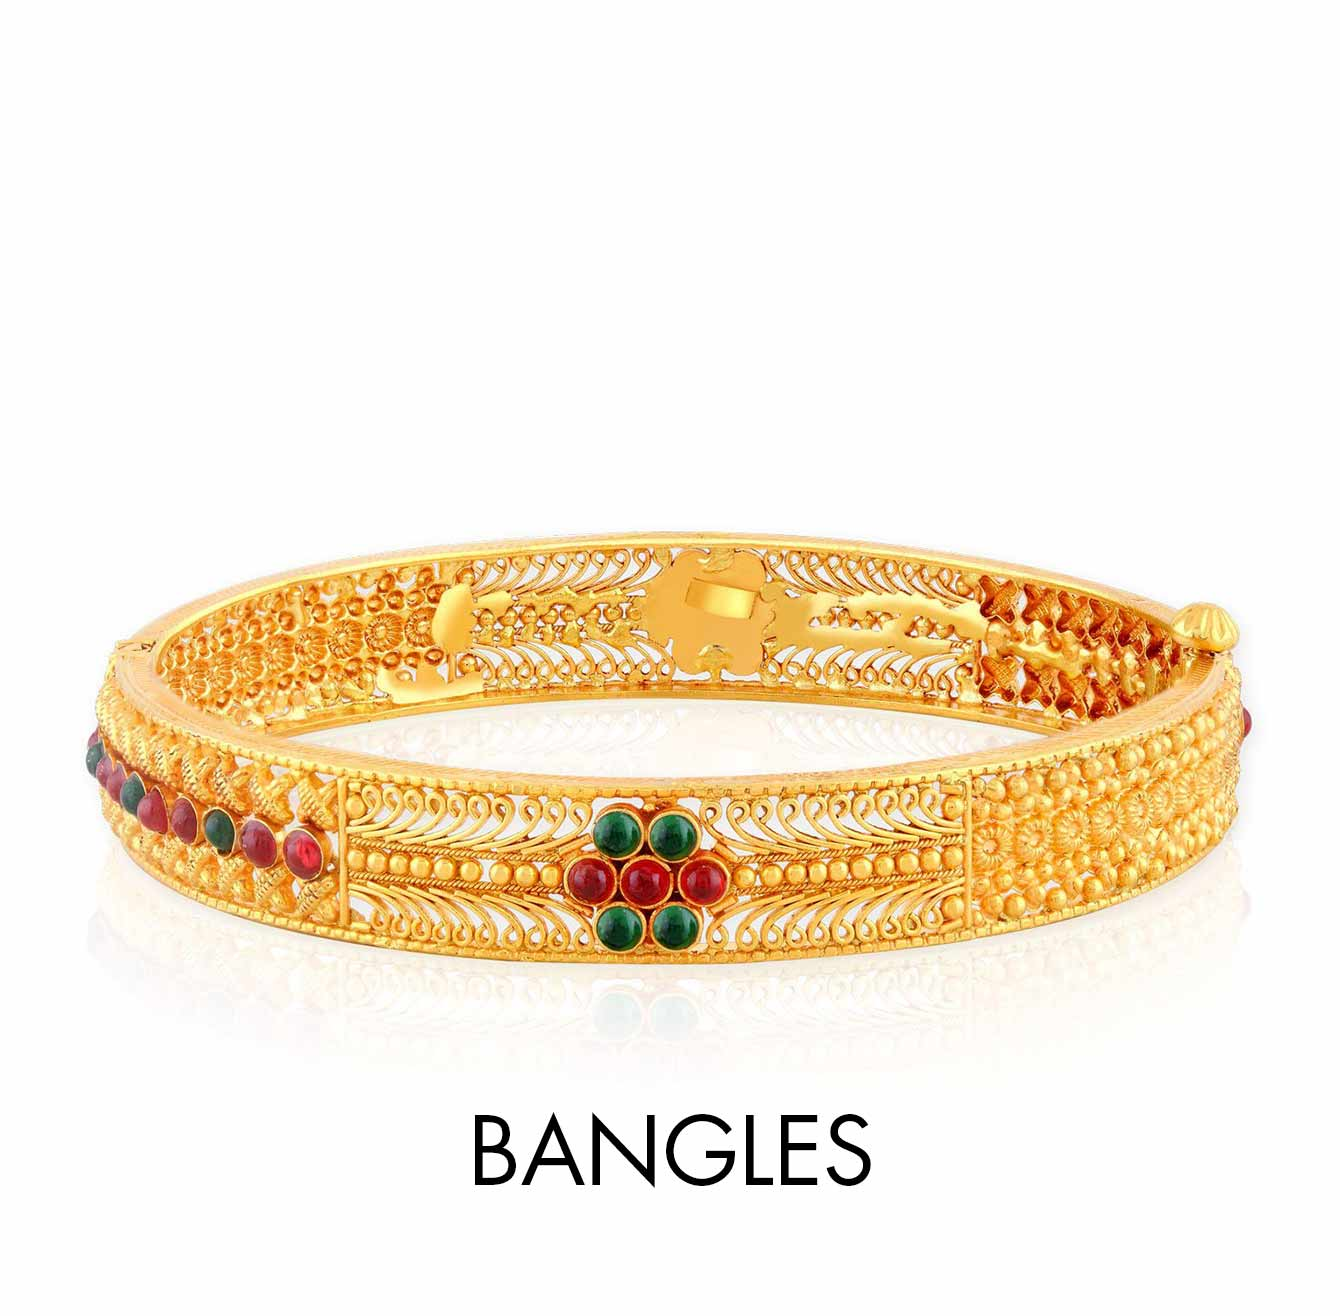 Malabar gold jewellery designs dubai - Malabar Gold Bangles Designs With Price